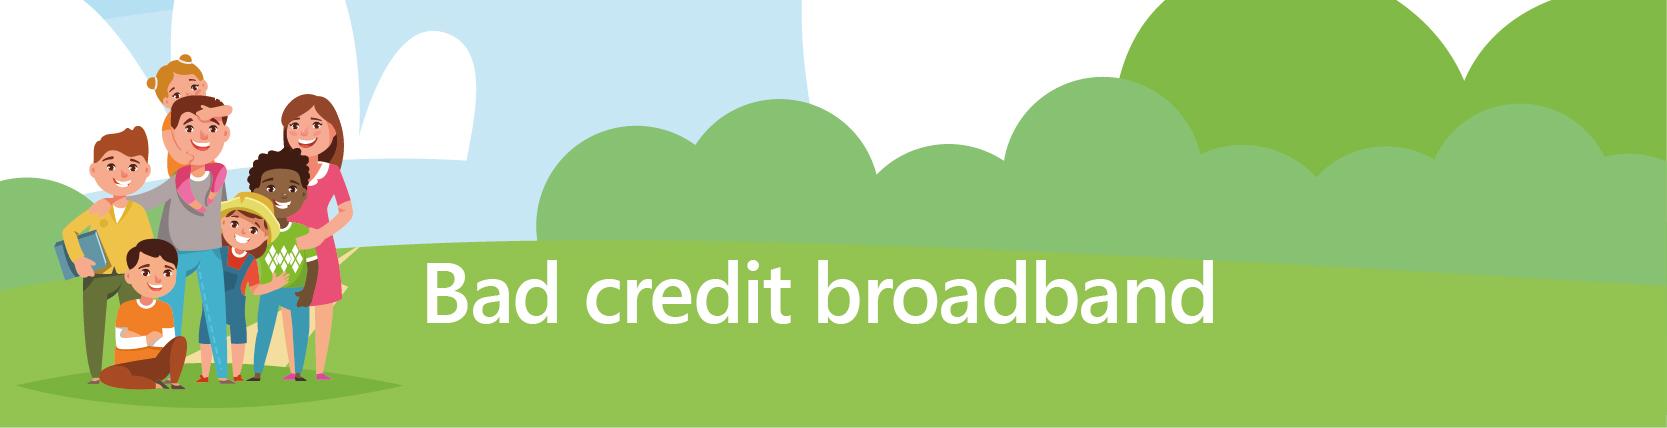 bad credit broadband